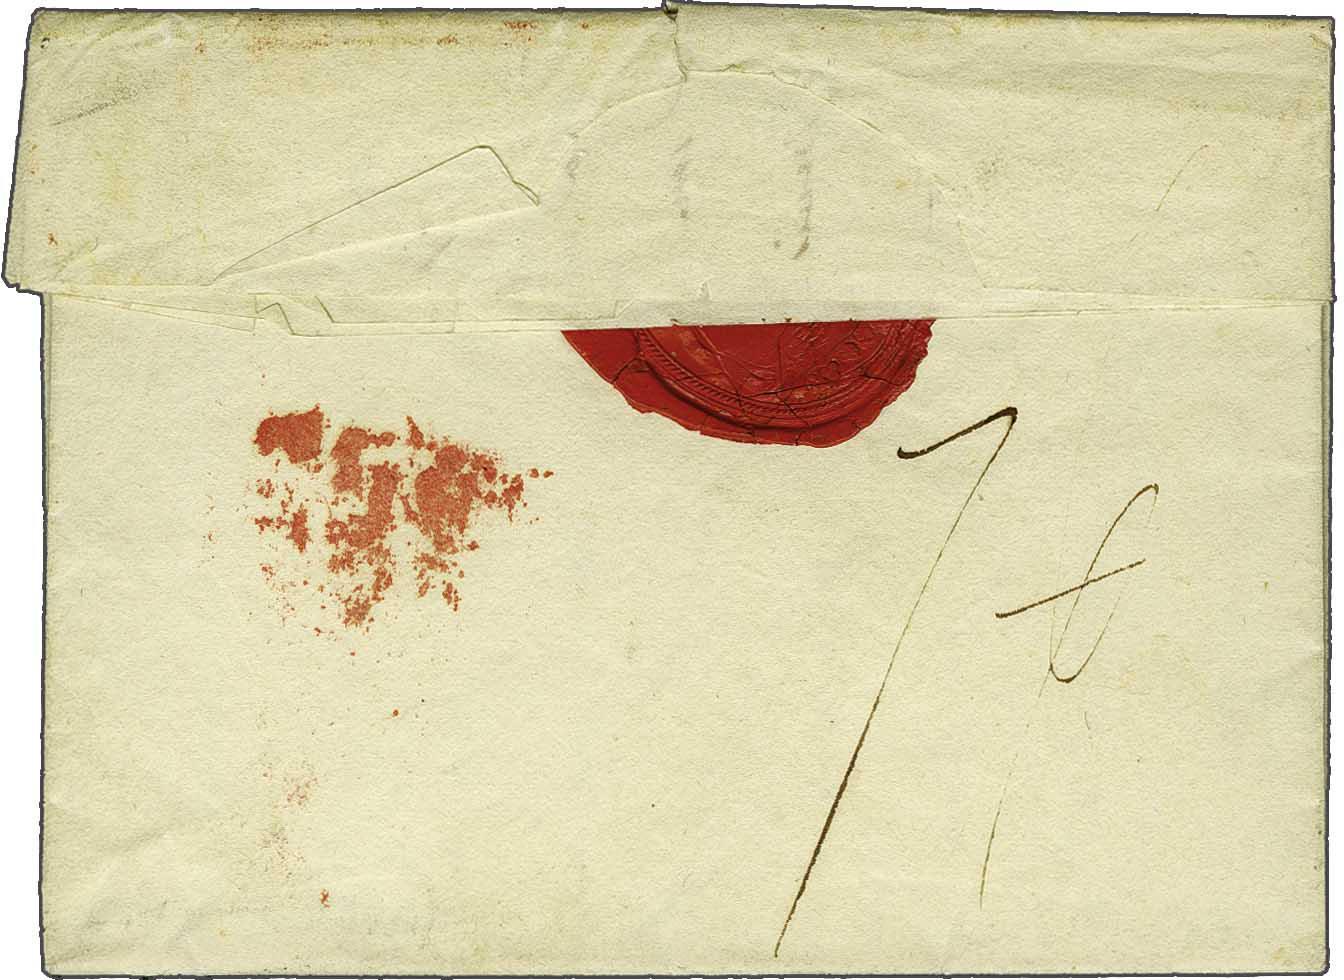 Lot 168 - Netherlands and Former Territories Netherlands -  Corinphila veilingen Auction 233: General sale